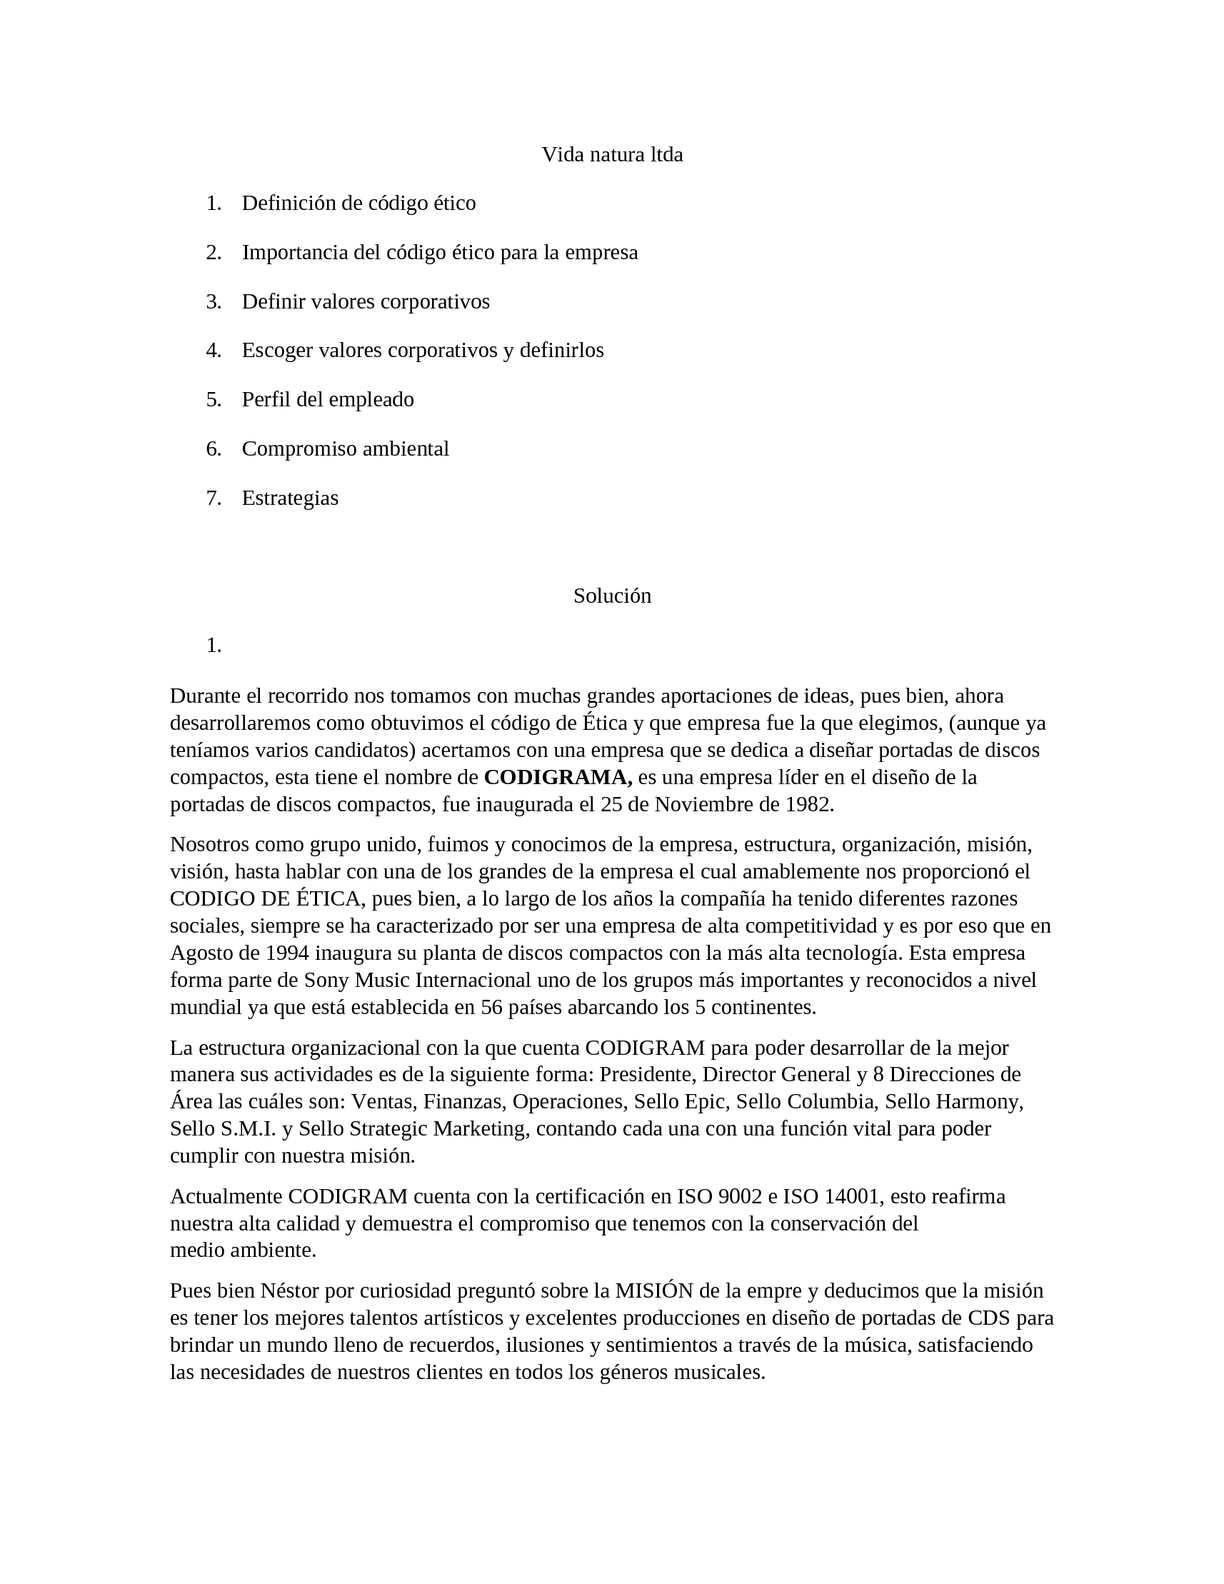 Calaméo Valores Corporativos De Vida Natura Ltda